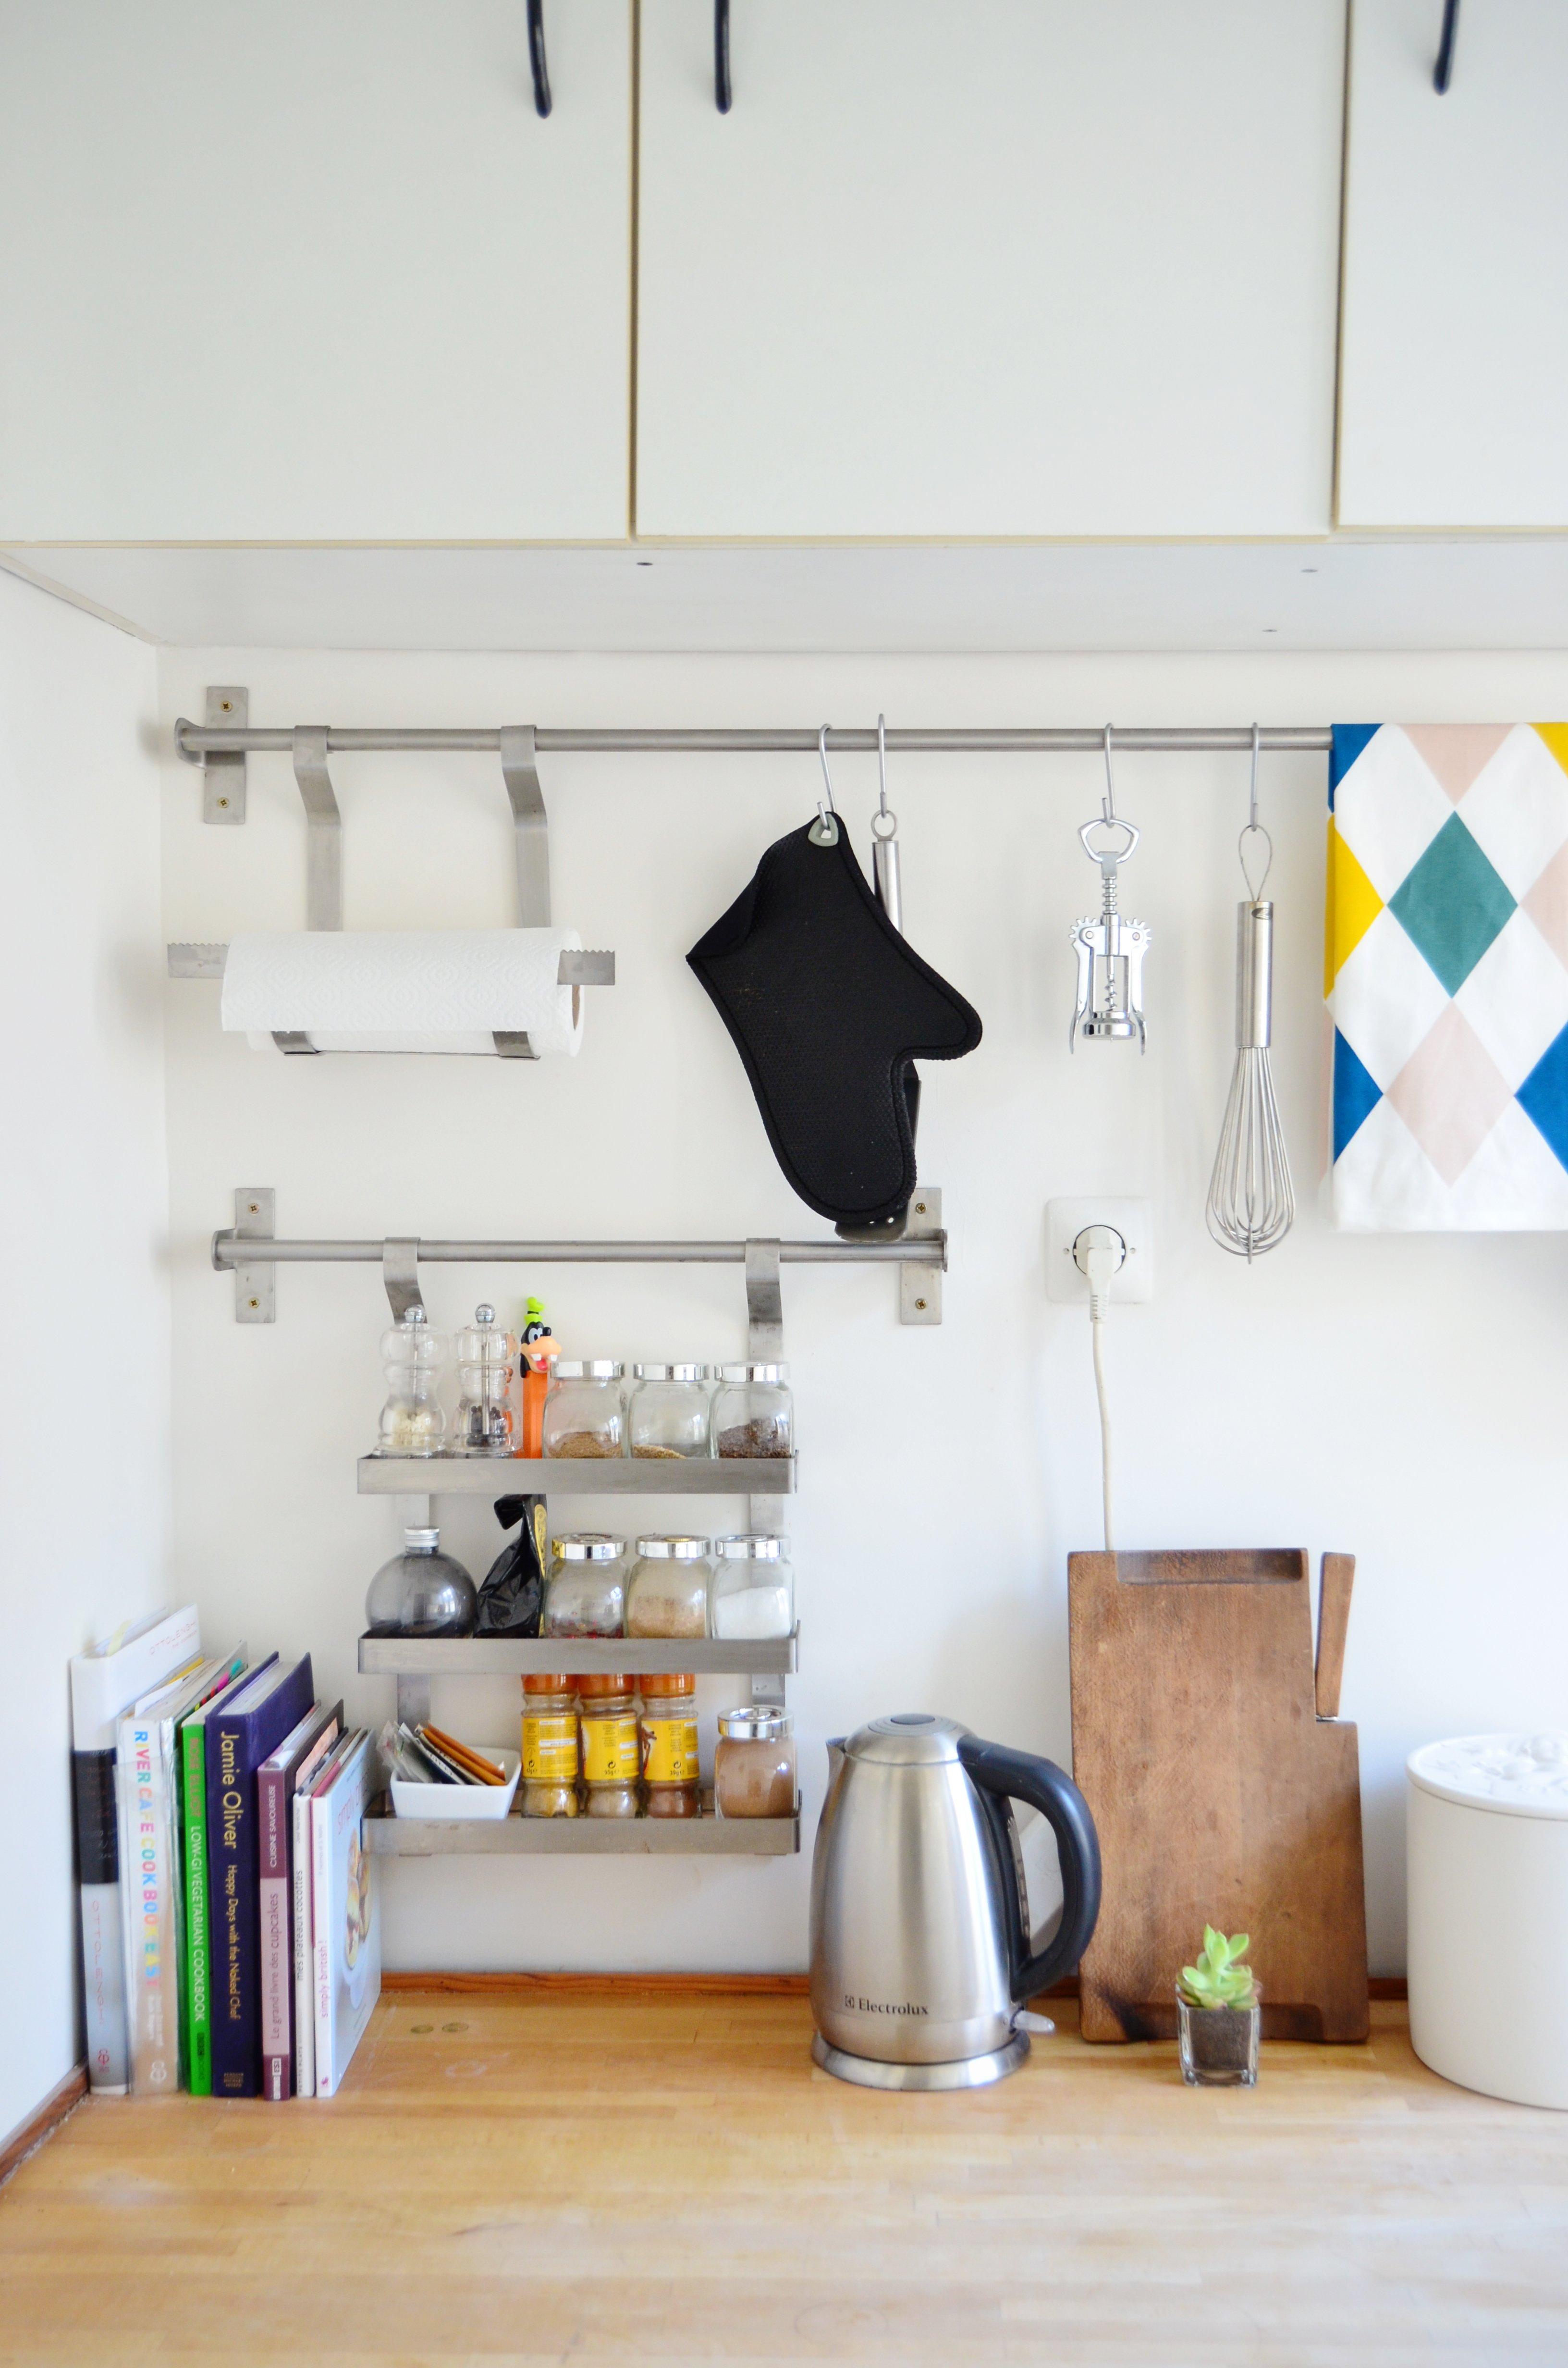 Ikea Grundtal Kitchen Organizing Ideas